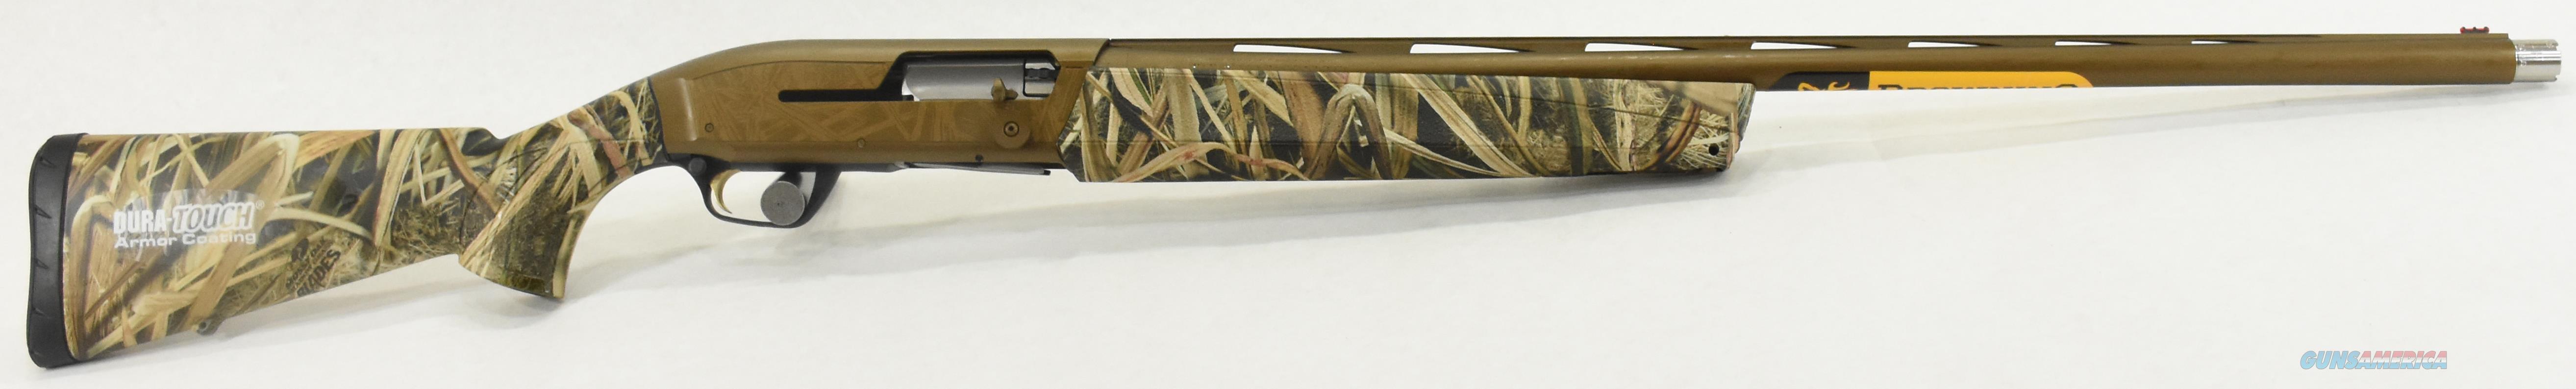 Maxus Wicked Wing MOSGB 12Ga 28-3In 011670304  Guns > Shotguns > Browning Shotguns > Autoloaders > Hunting